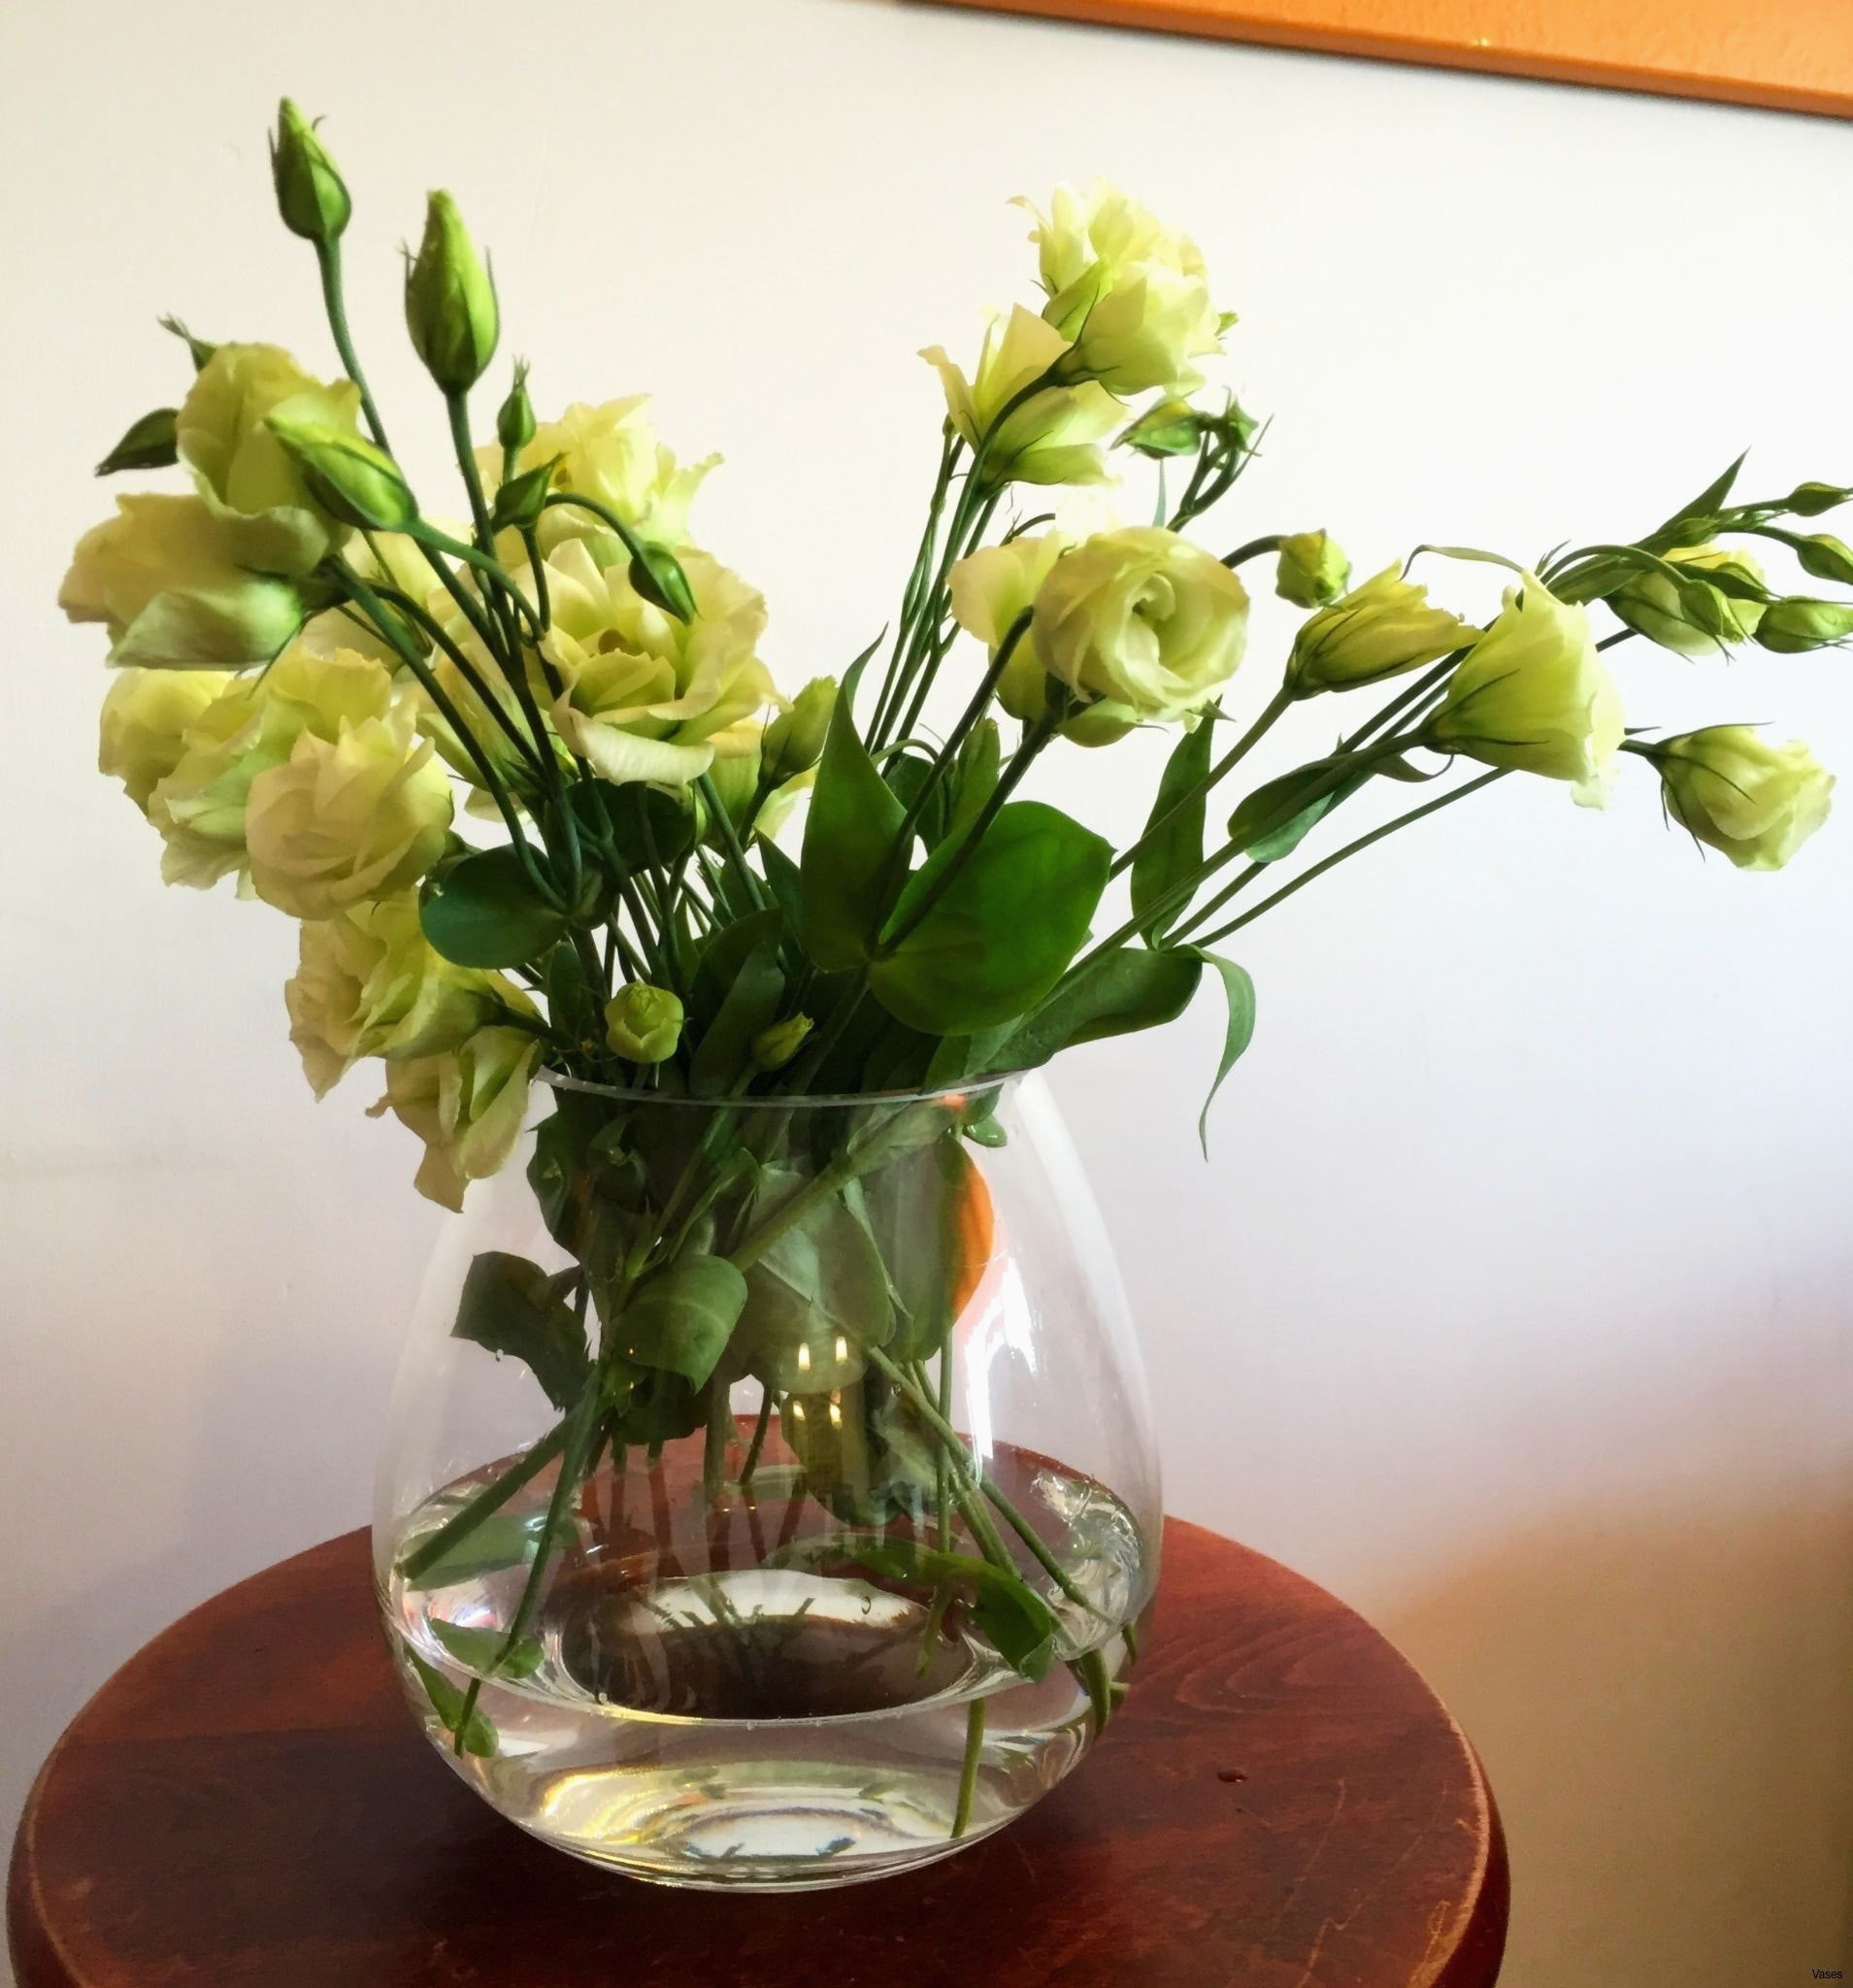 tall vase white flower arrangements of 42 expensive flower arrangement for dining table stampler for dining table centerpieces lovely flower vase table 04h vases tablei 0d clipart dining base end design